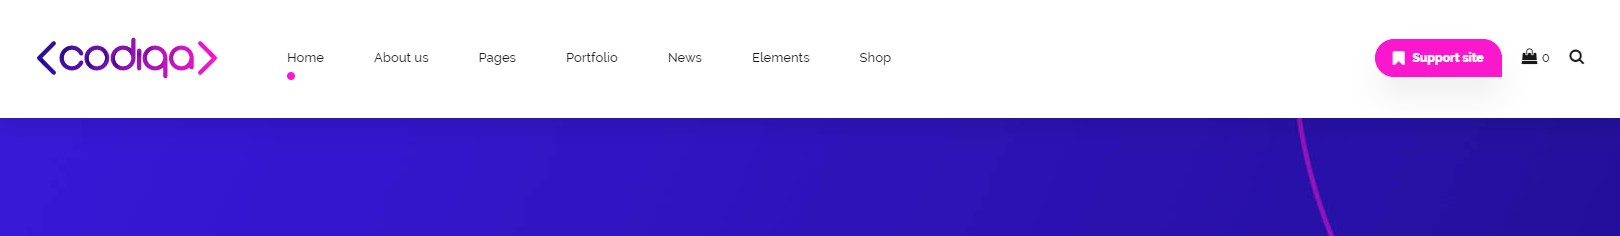 https://documentation.bold-themes.com/codiqa/wp-content/uploads/sites/49/2019/10/below-menu-false.jpg